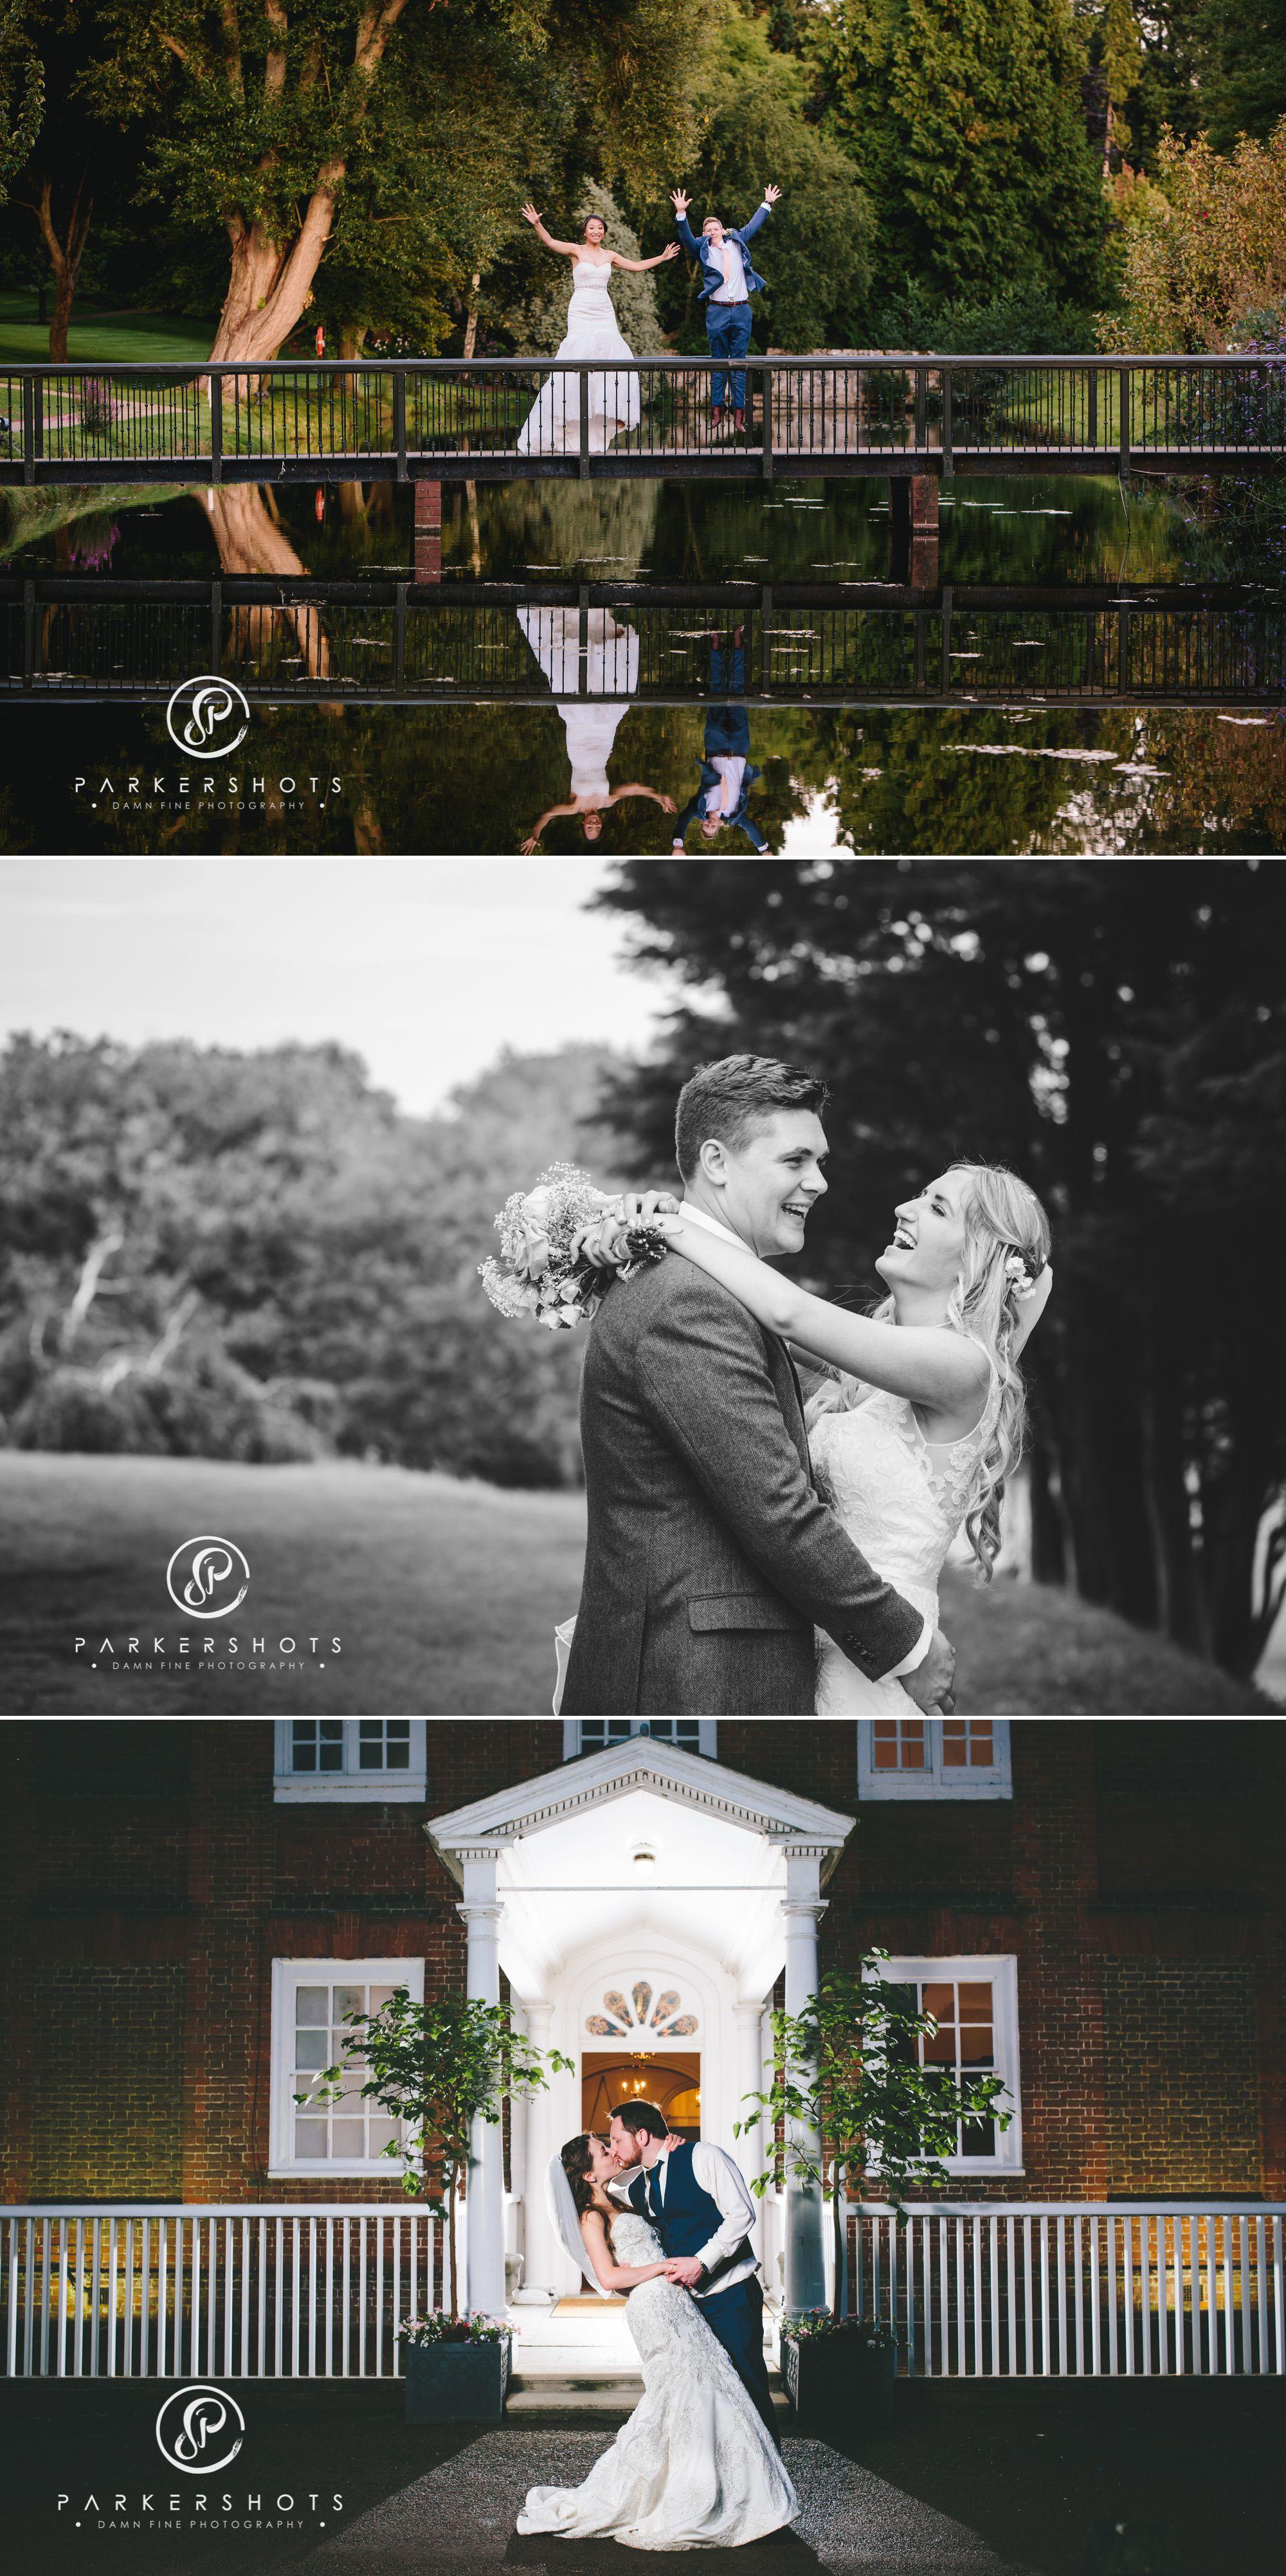 Best_Of_Wedding_Photographer_2015 29